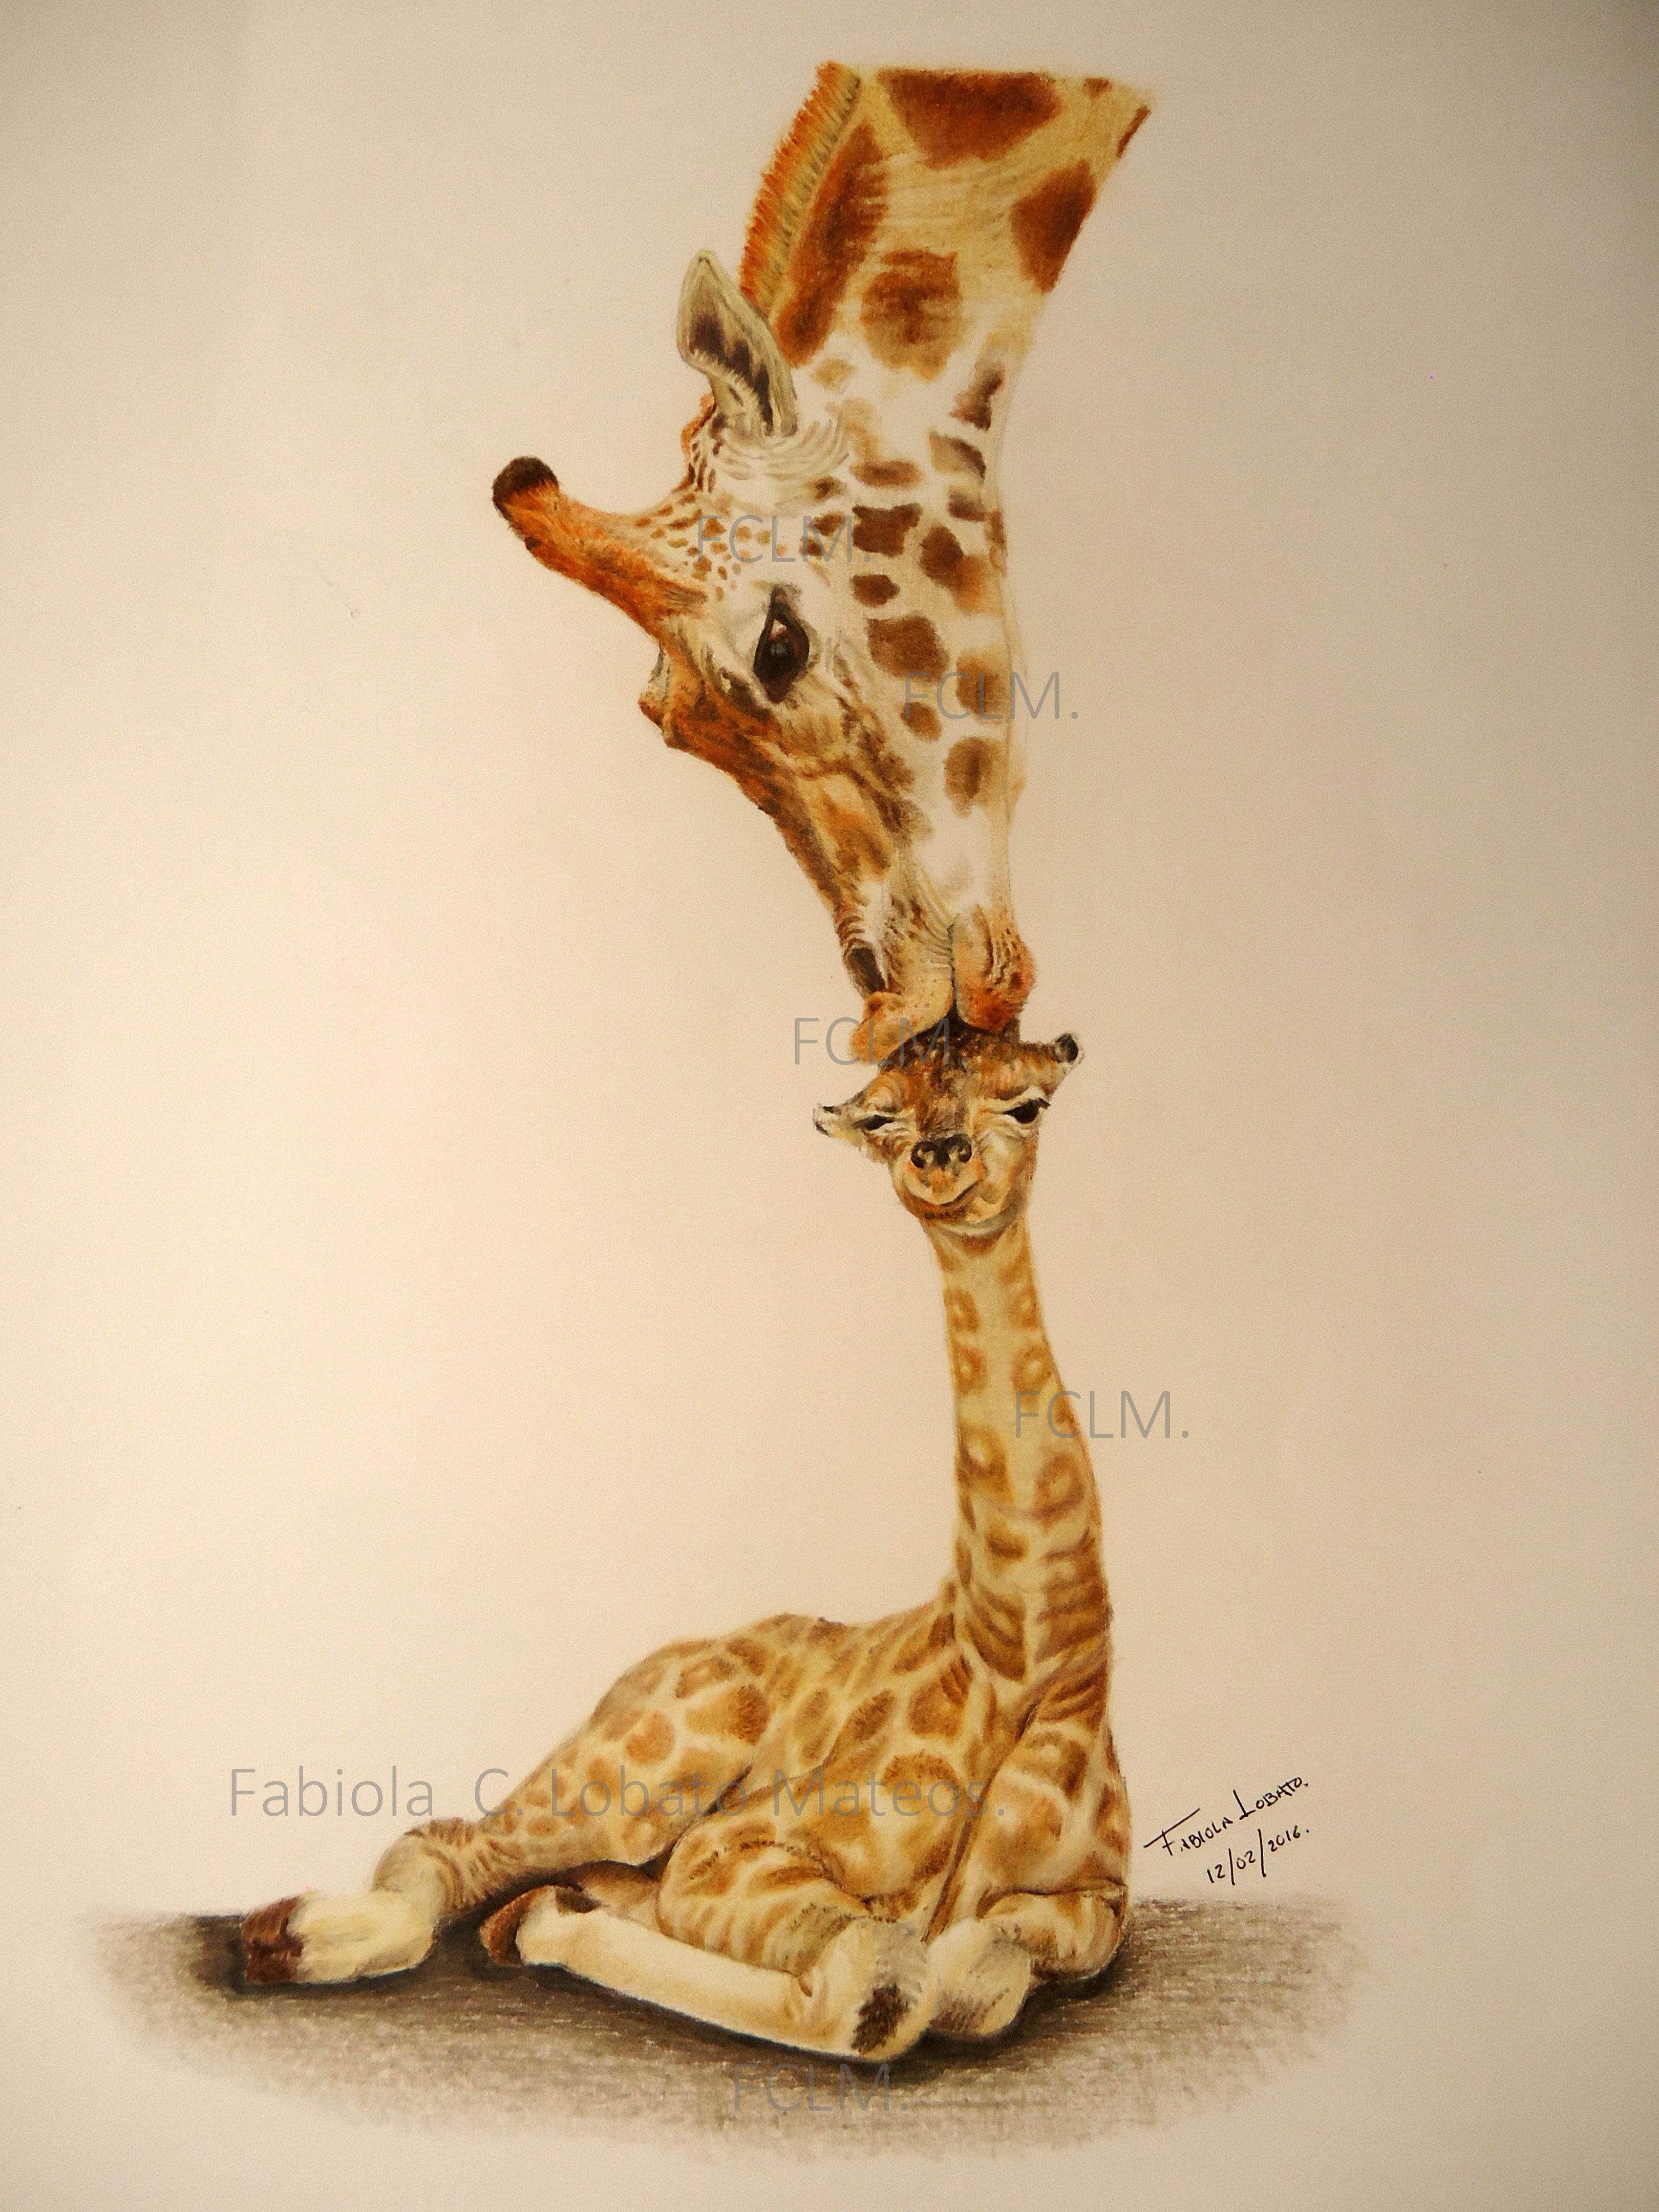 Dibujo Con Lapices De Colores De Una Madre Jirafa Con Su Bebe Color Pencil Drawing Of A Giraffe Mom With Her Baby Art Sketches Drawings Art